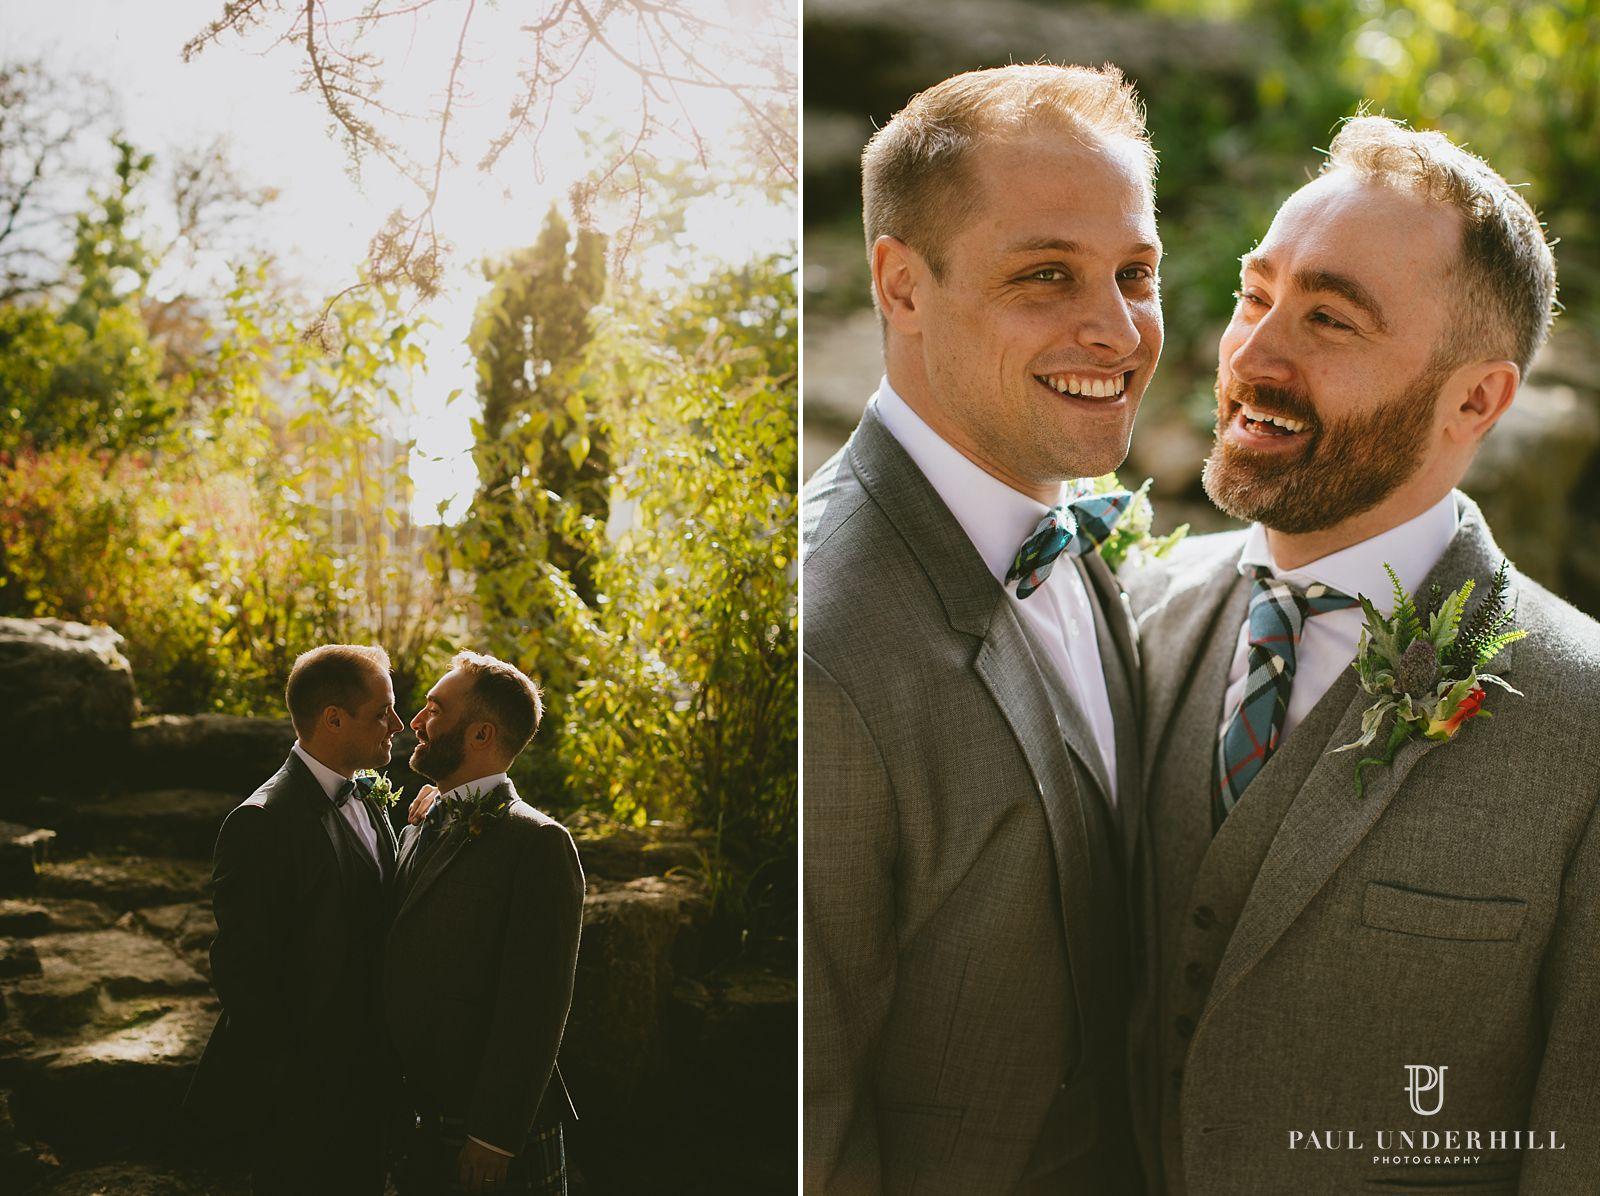 portraits-of-grooms-gay-wedding